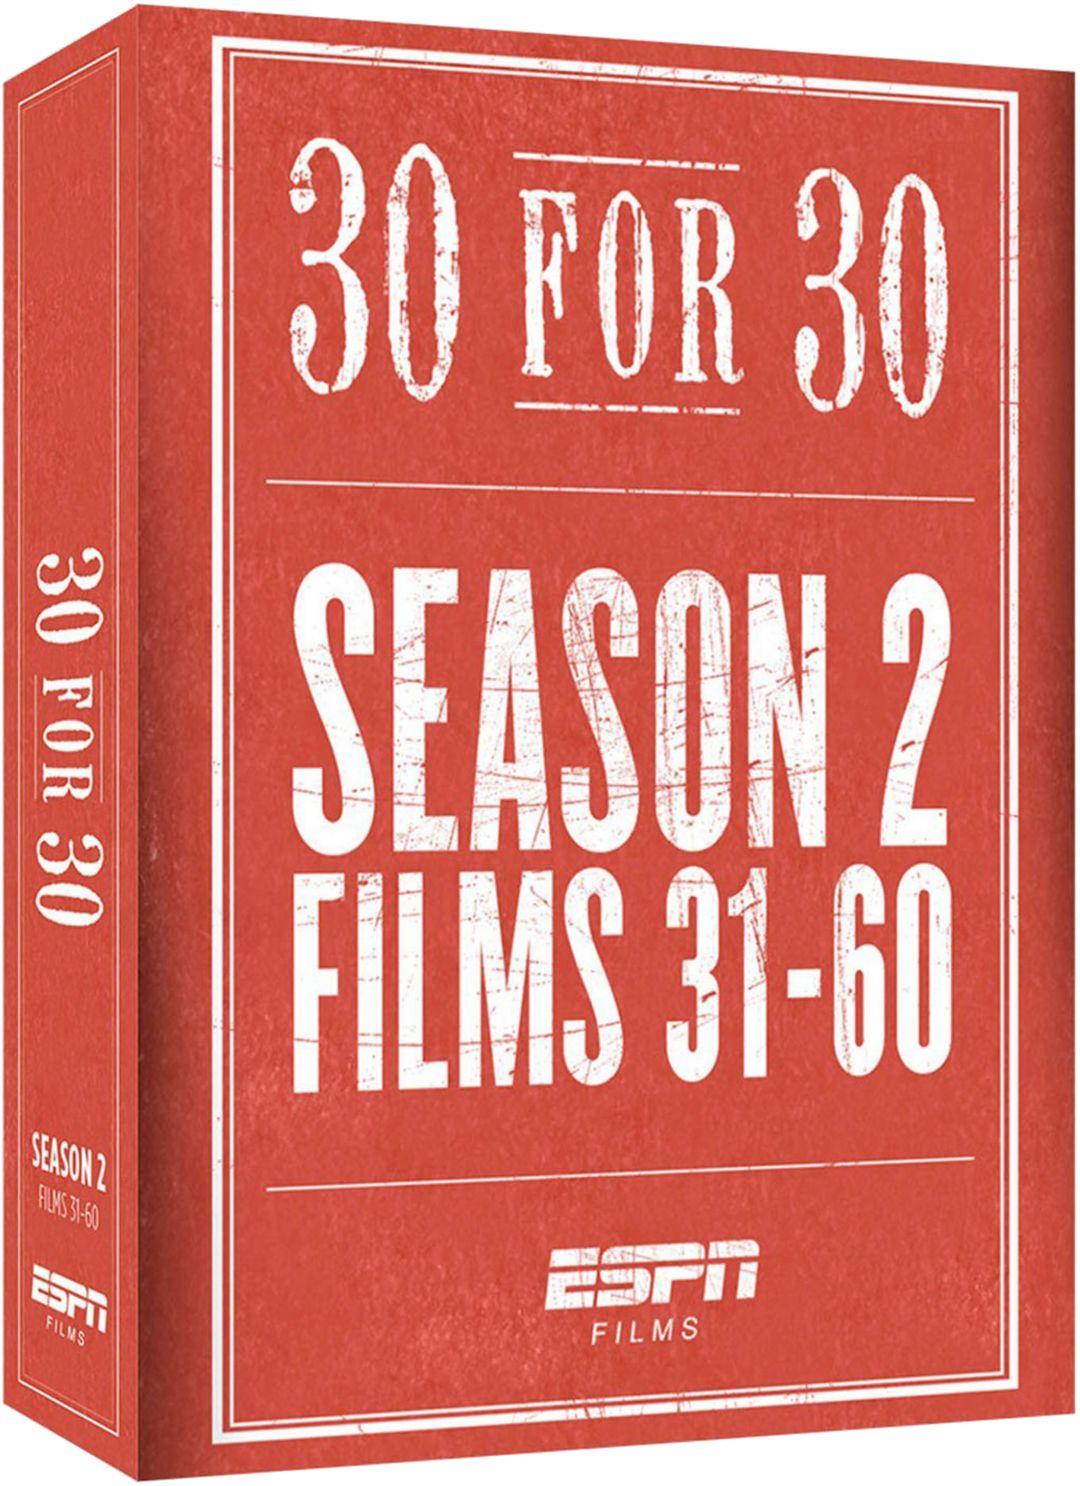 ESPN Films 30 for 30: Complete Season 2 DVD Set